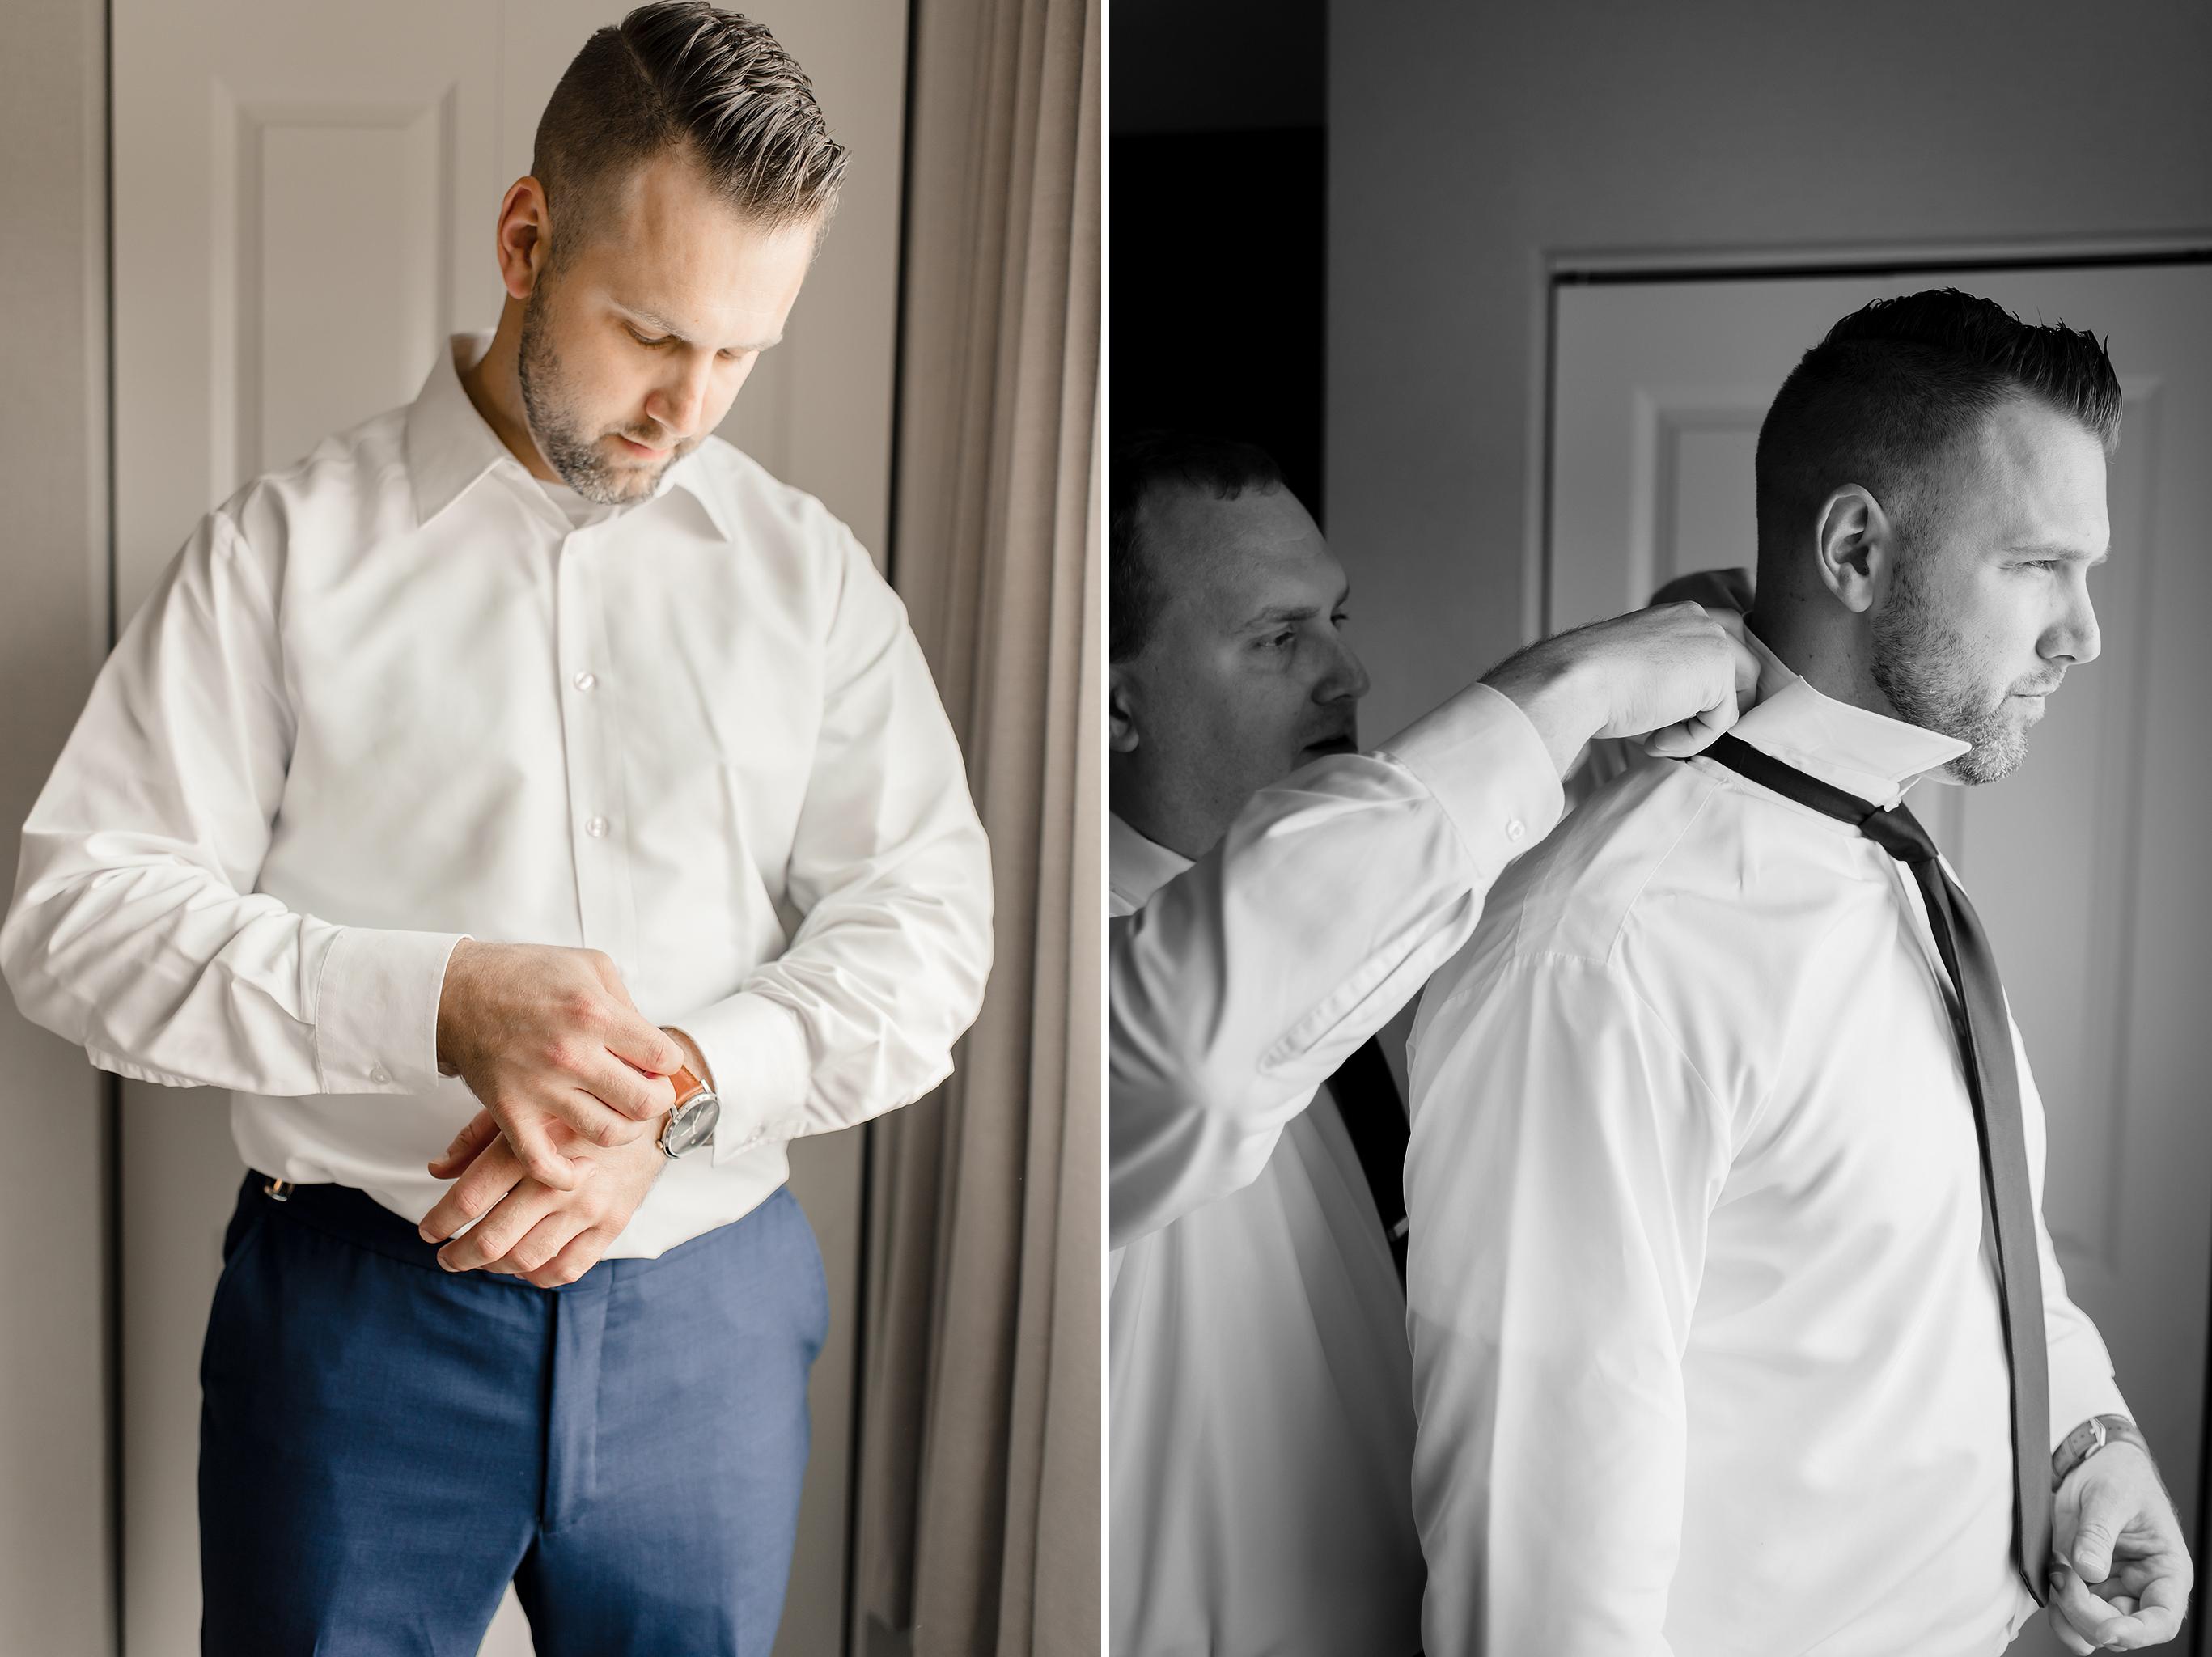 LINDSAY-ADKINS-PHOTOGRAPHY-MICHIGAN-WEDDING-PHOTOGRAPHER-FRANKENMUTH-BREWERY-WEDDING-MICHIGAN-BLOG-2